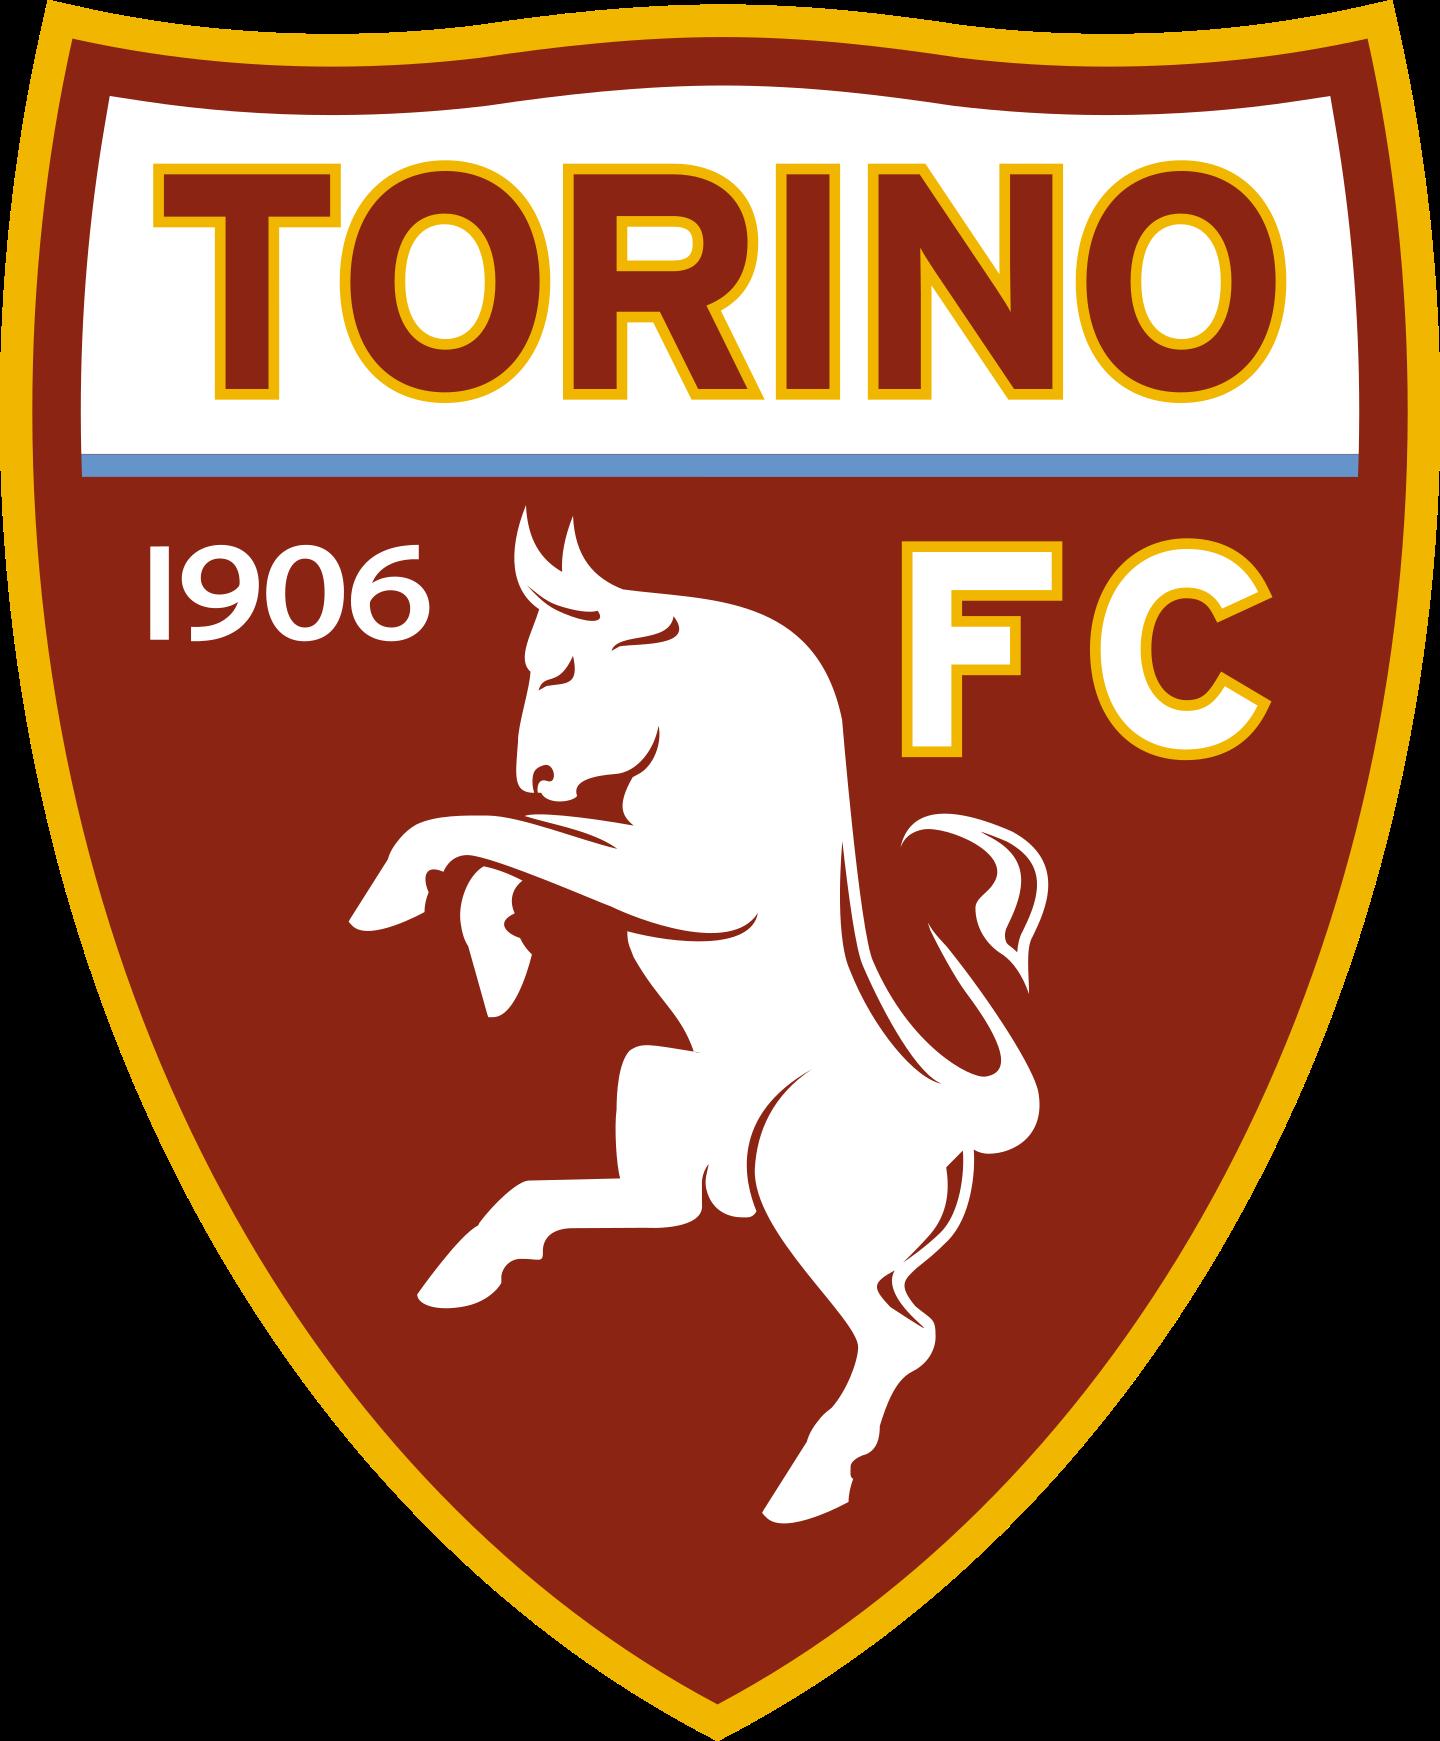 torino fc logo 2 - Torino FC Logo